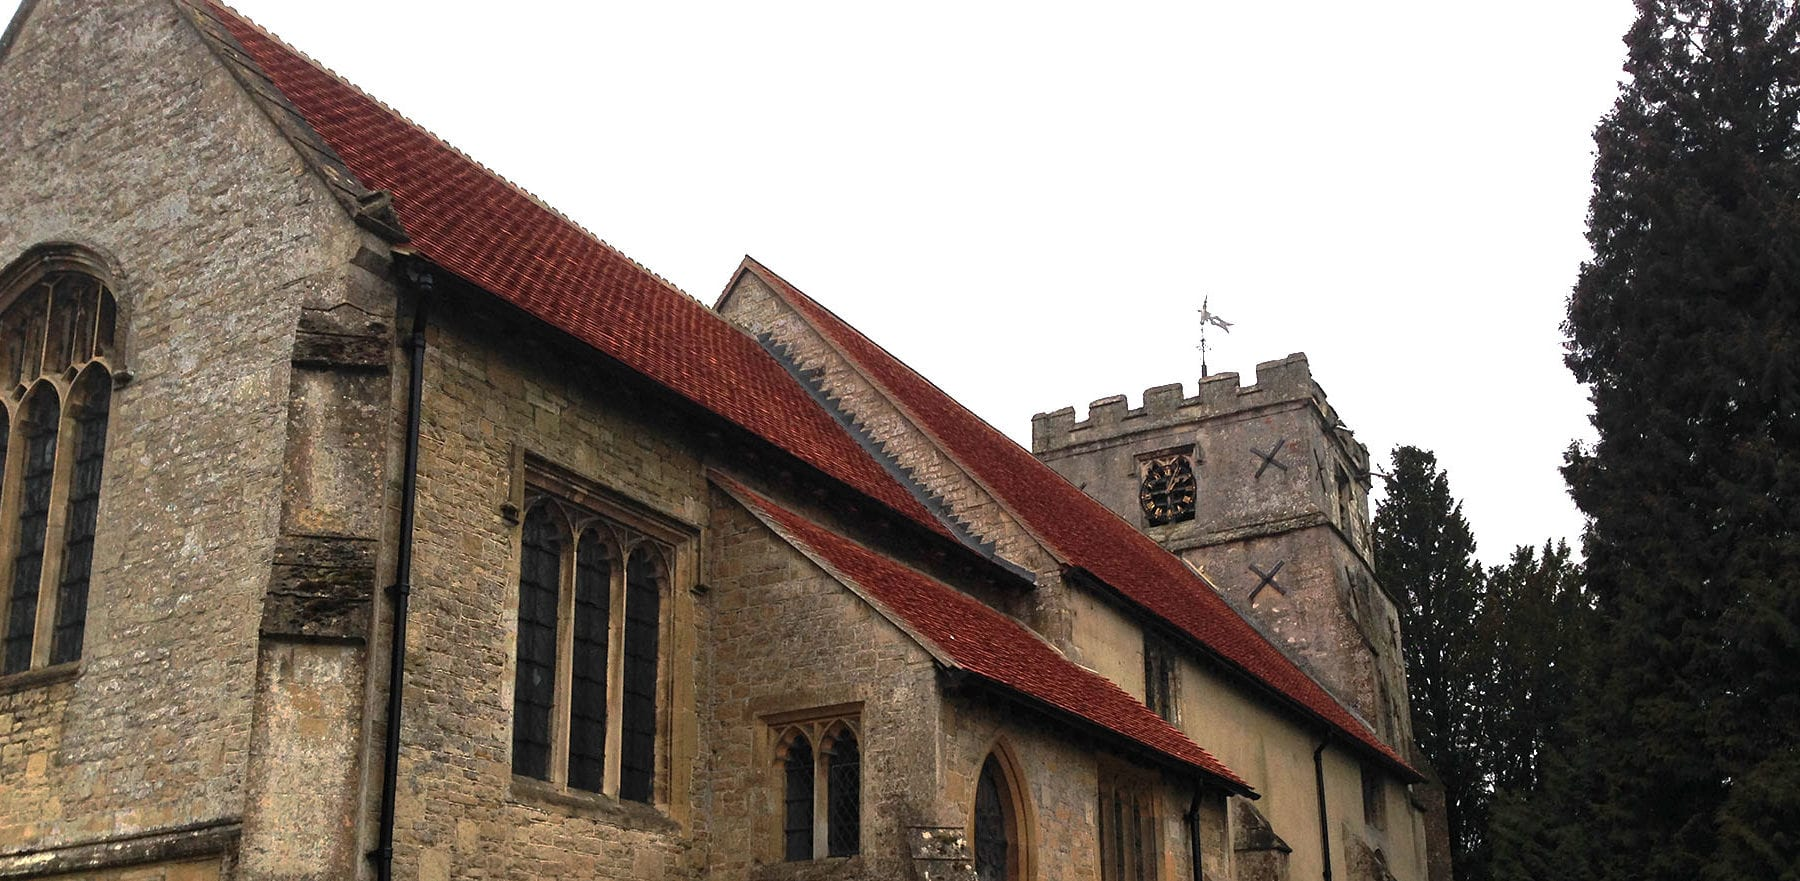 Lifestiles - Handcrafted Orange Clay Roof Tiles - Letcombe, England 6